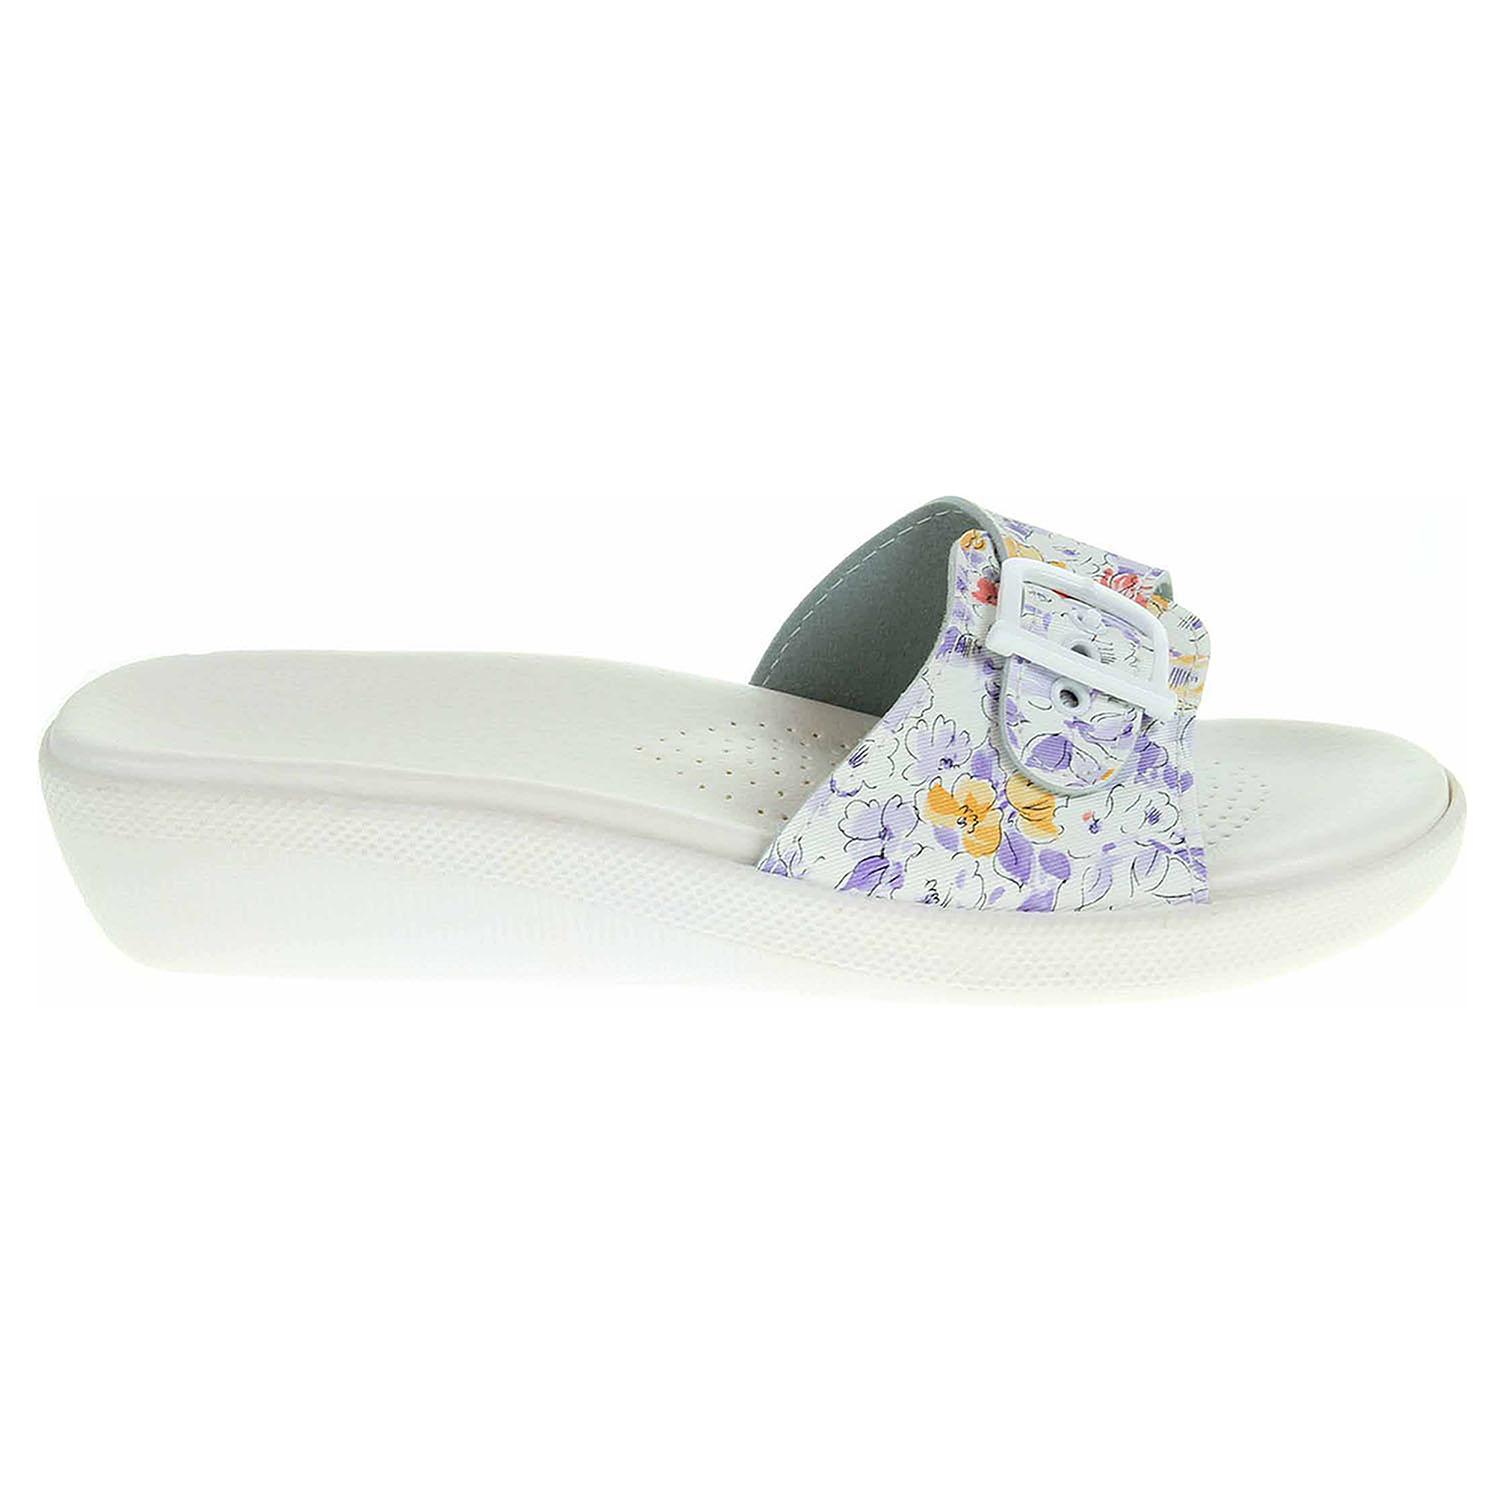 Ecco Dámské pantofle 5-20105 fialové 23400338